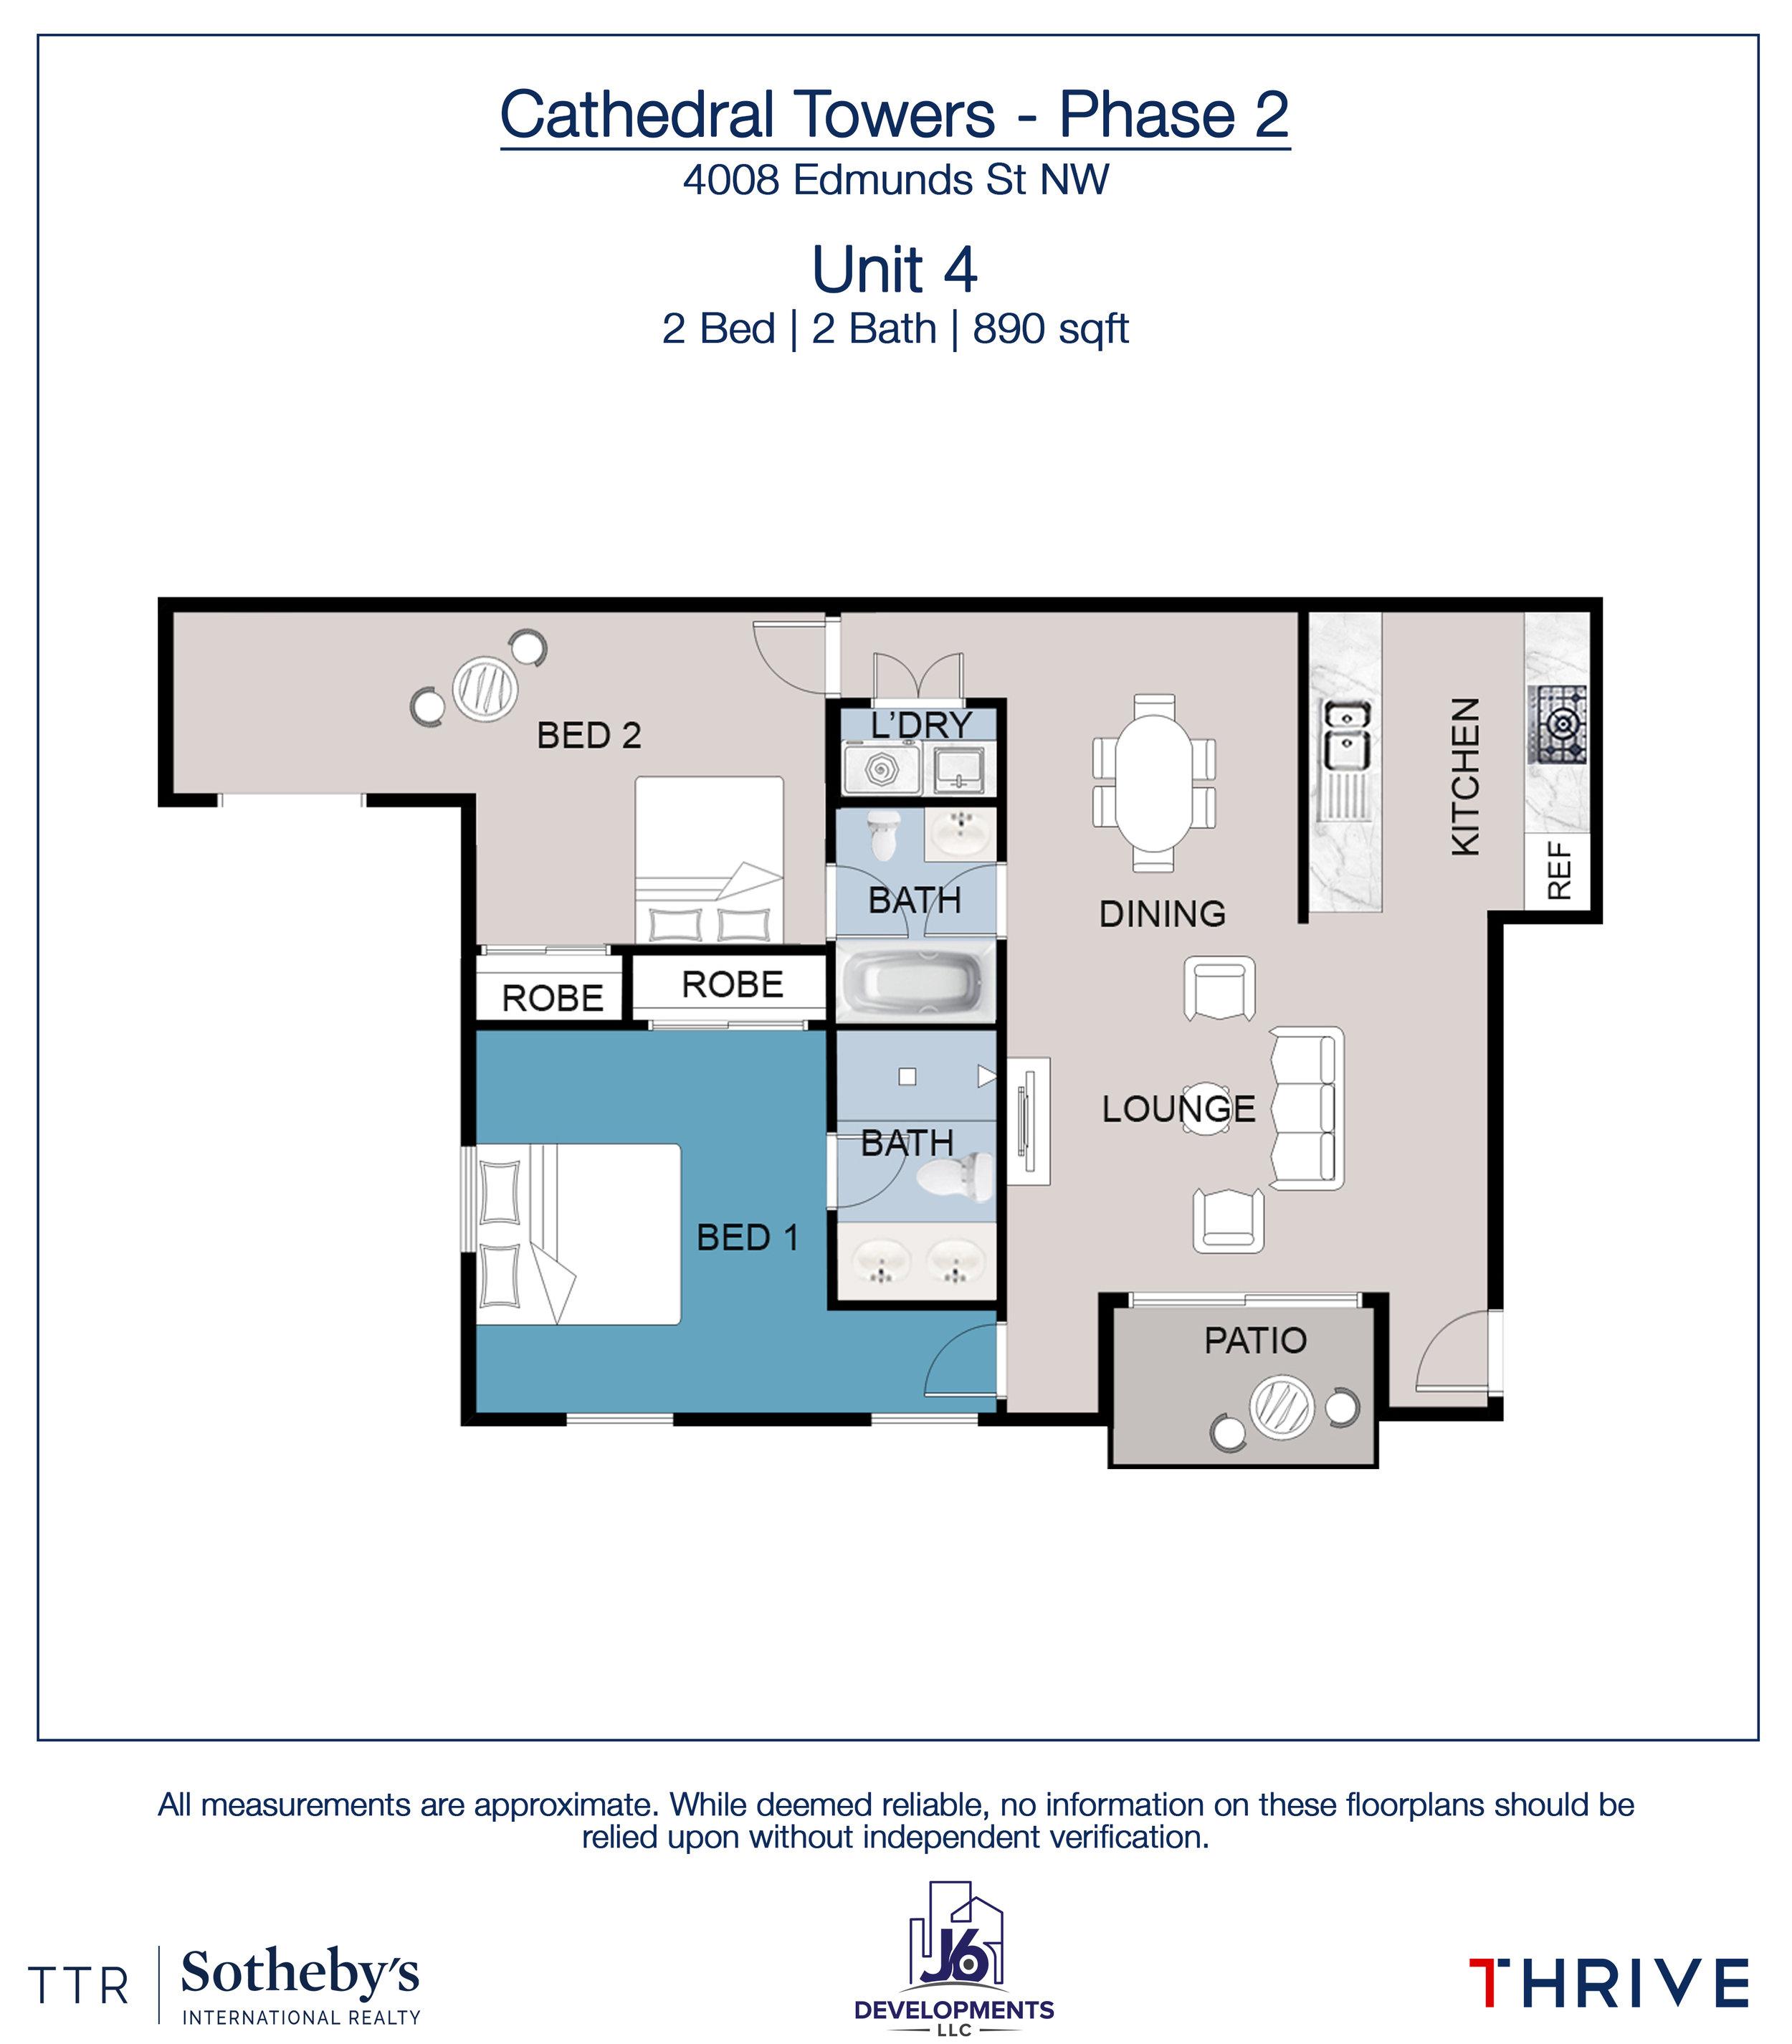 4008 Edmunds Unit 4 - Floorplan - 7.31.18.jpg